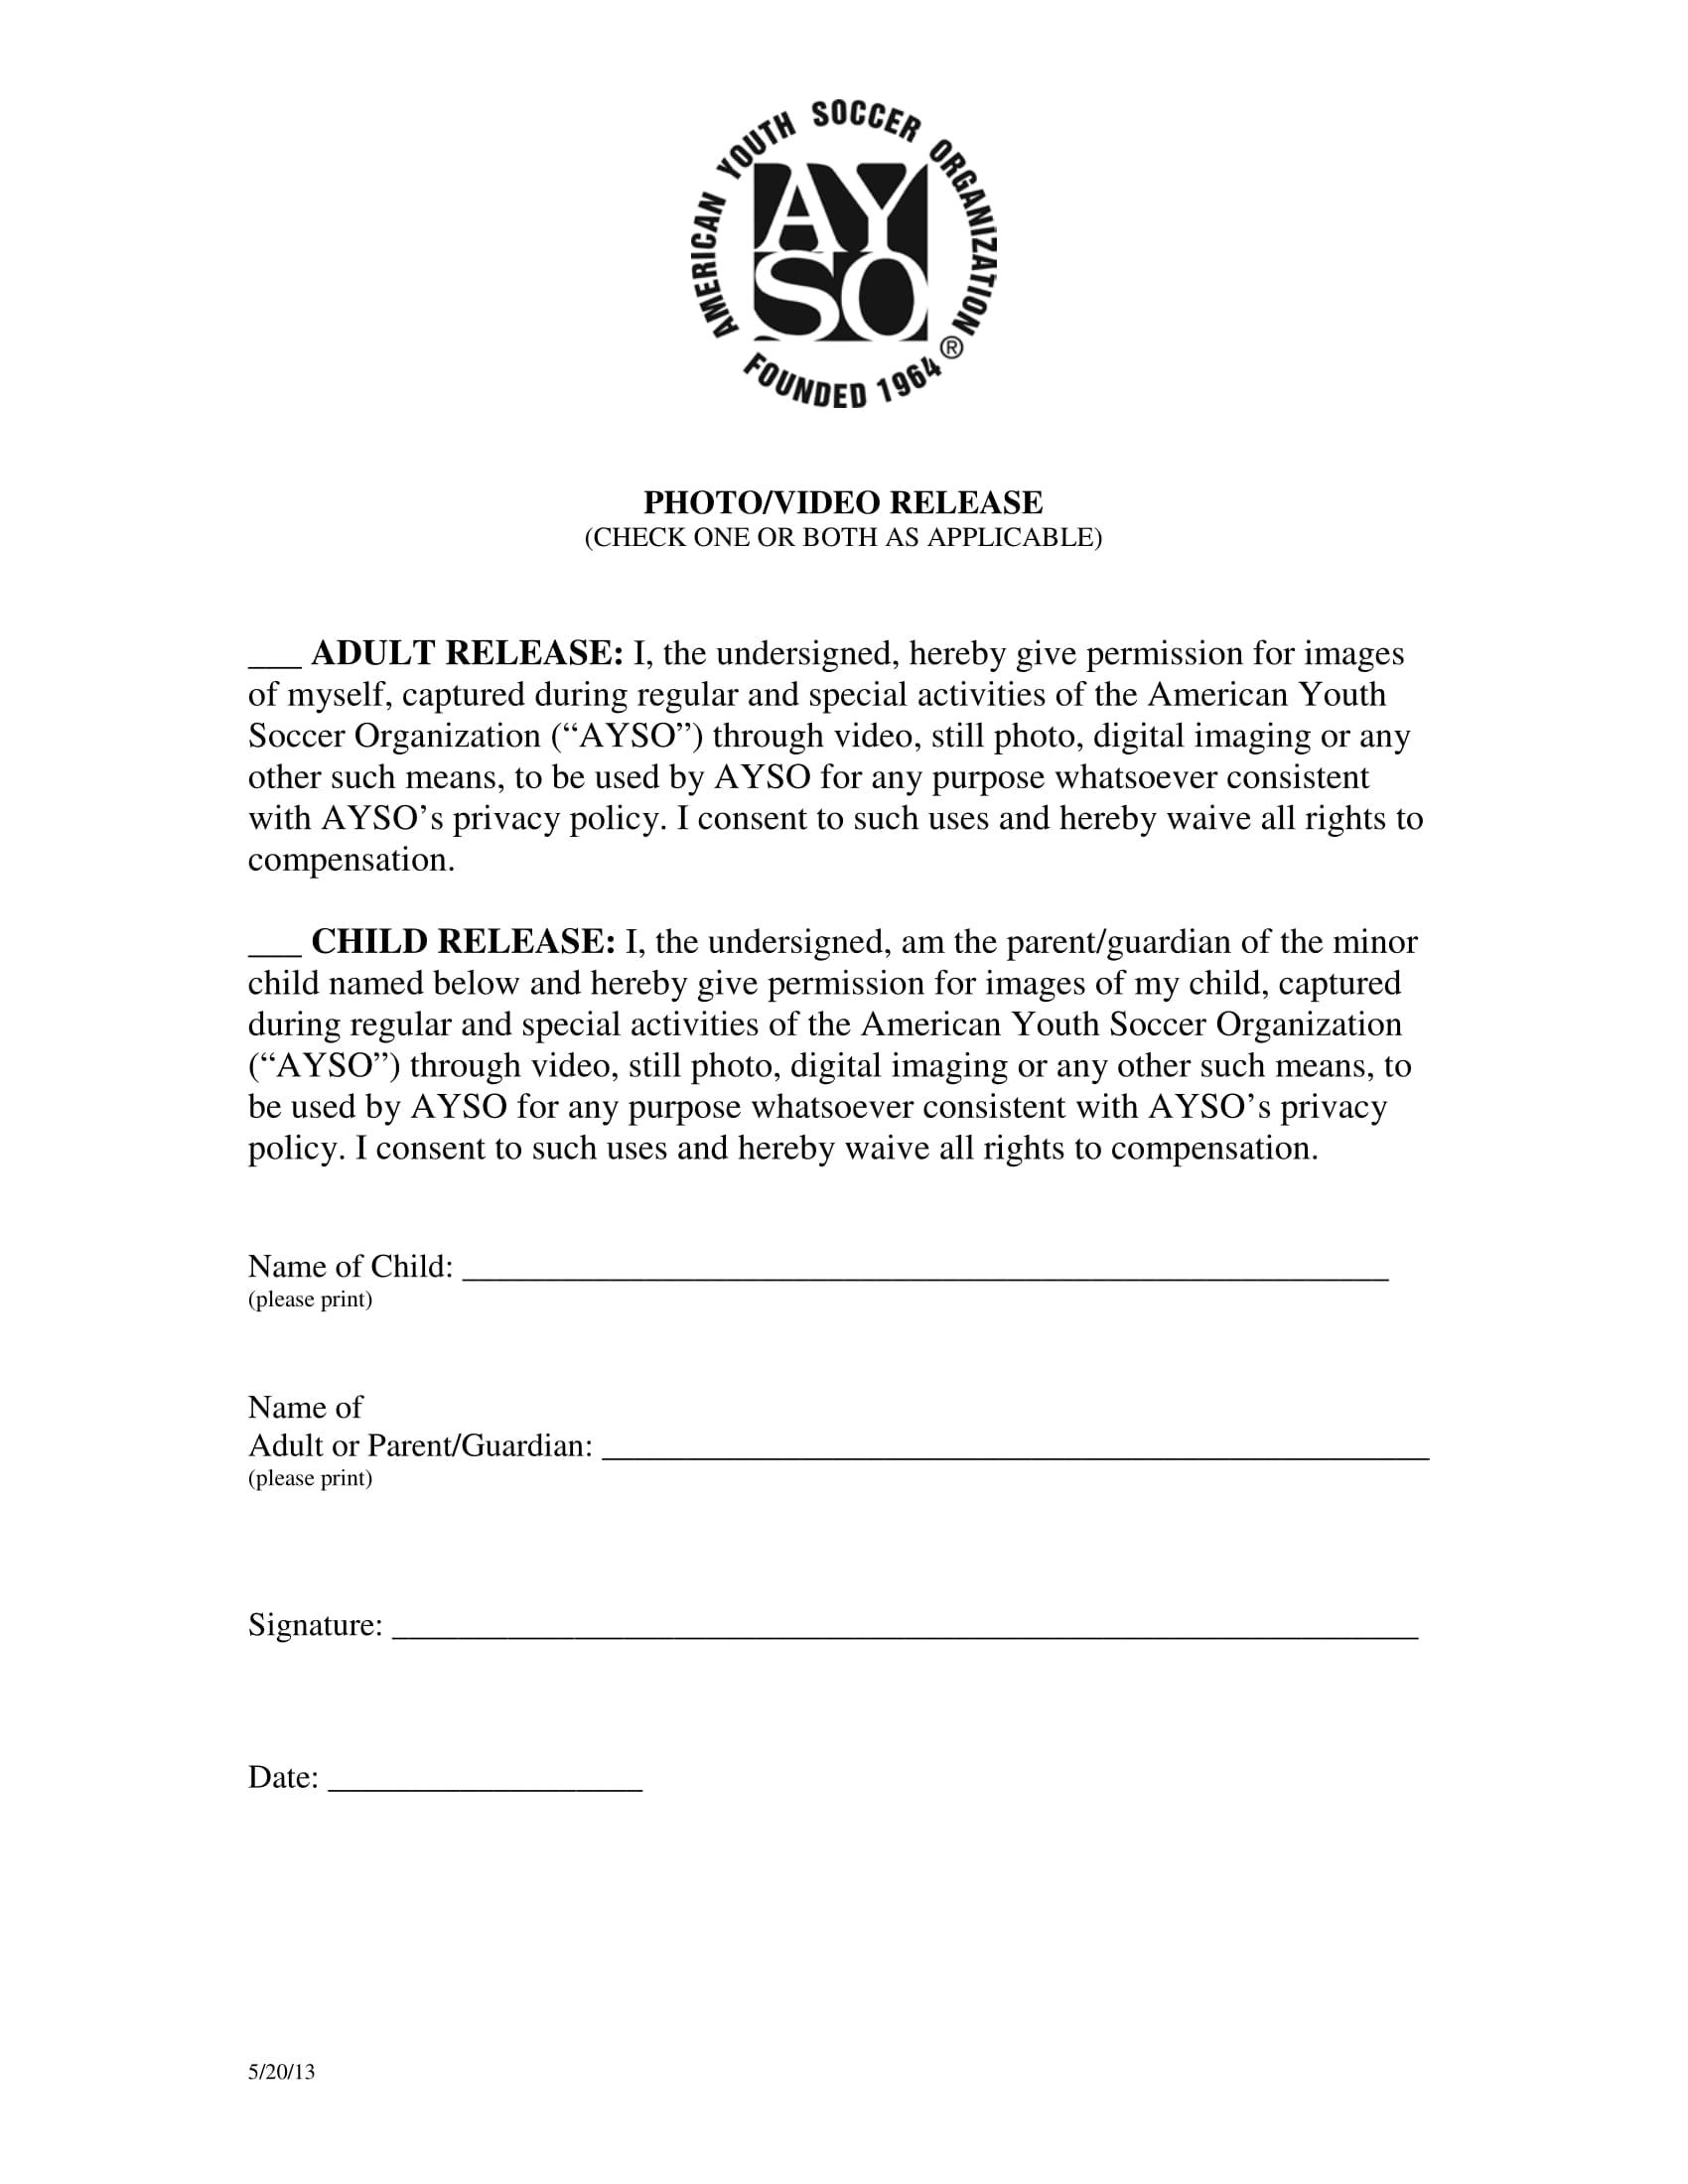 copyright release form - solarfm.tk